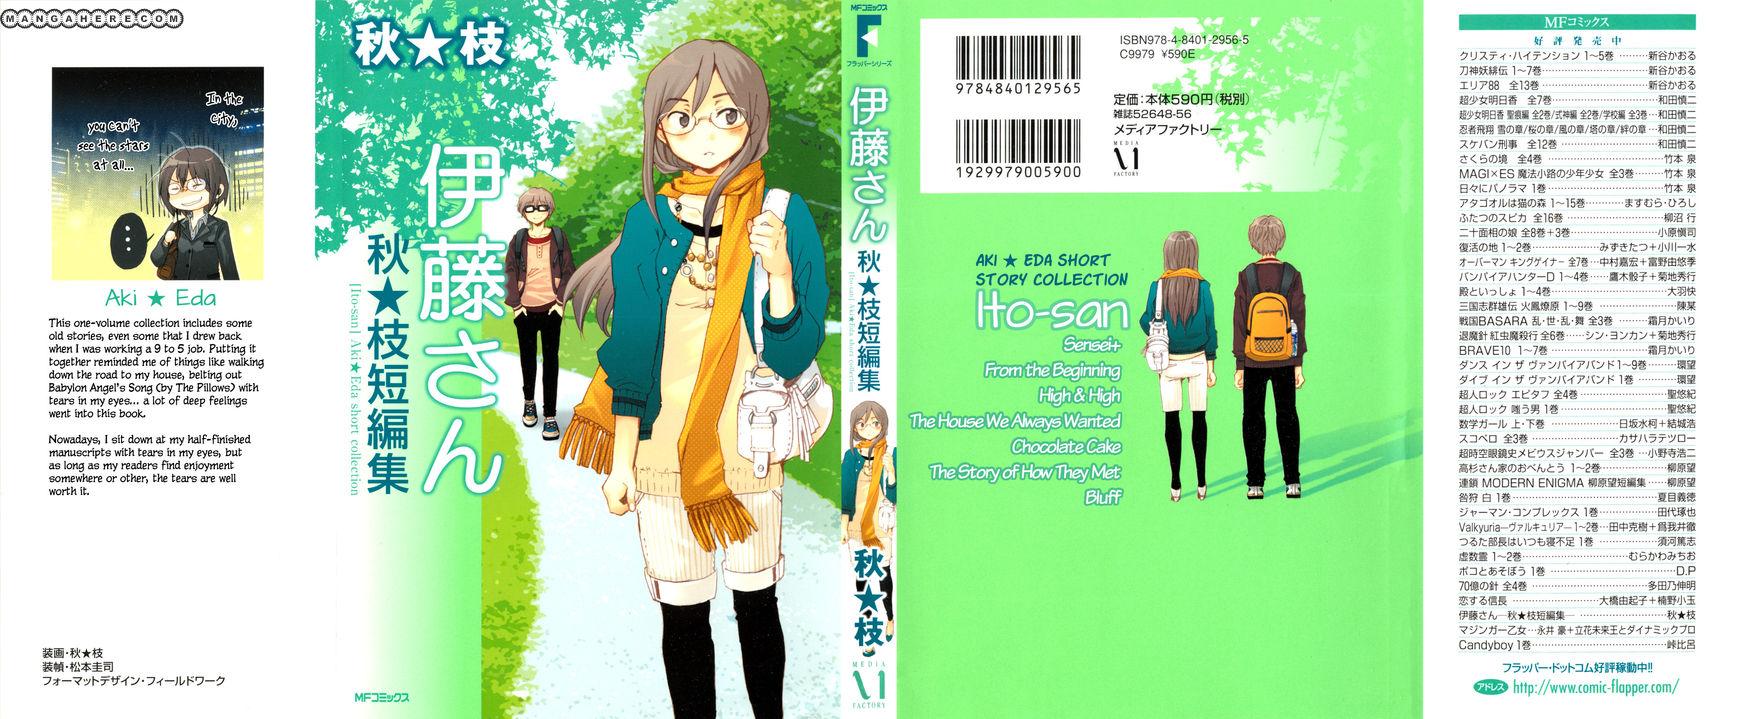 Itou-san 1 Page 1